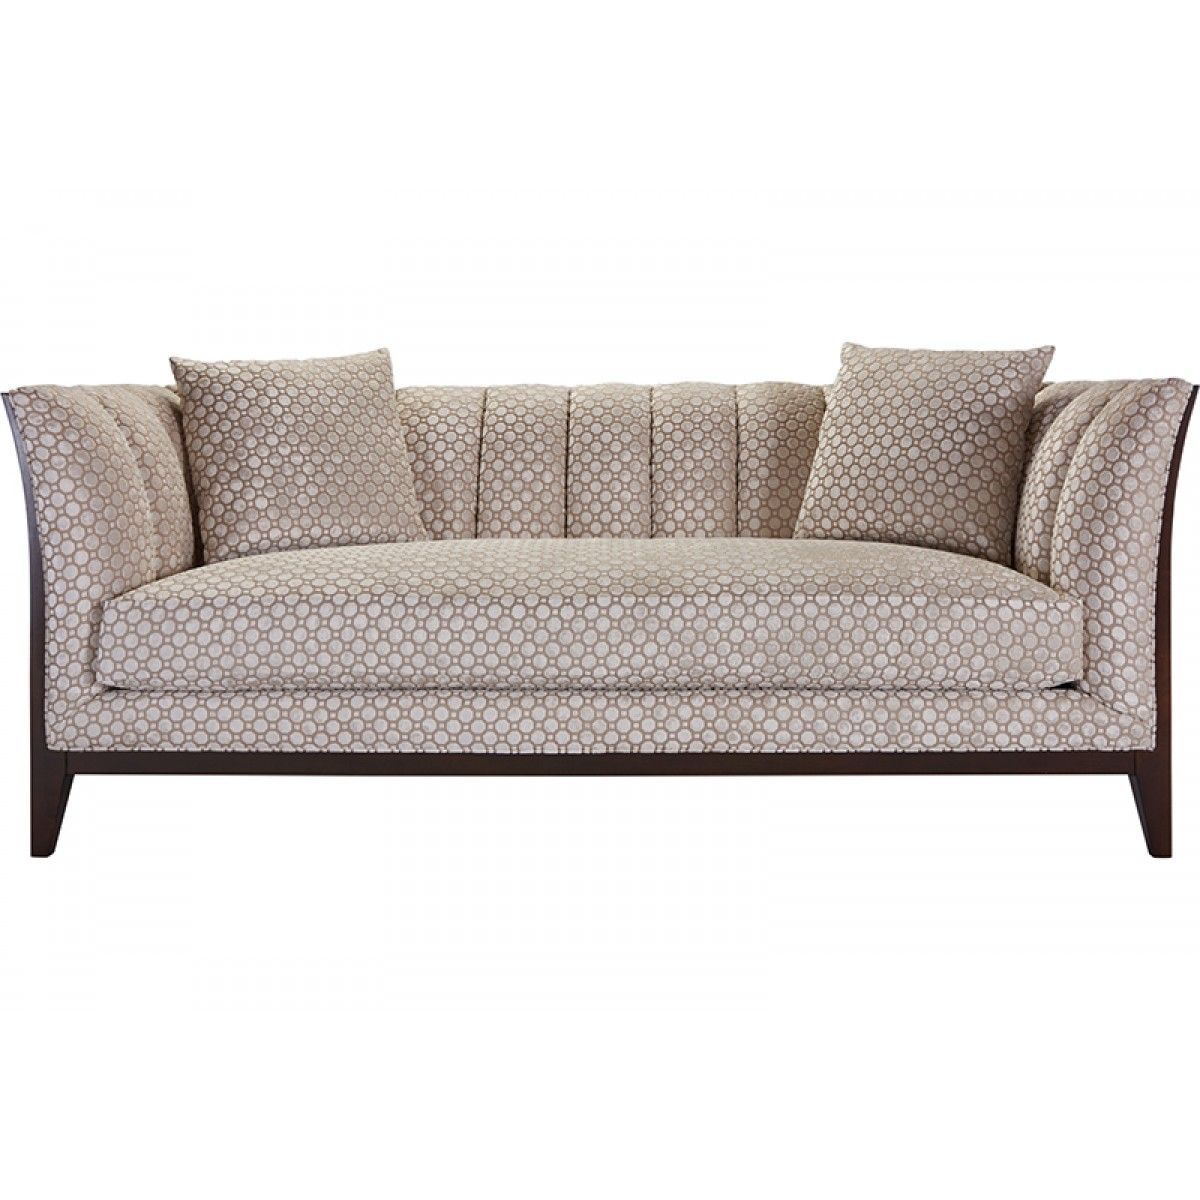 Hickory Chair Alexa Hampton Zachary Sofa Furniture